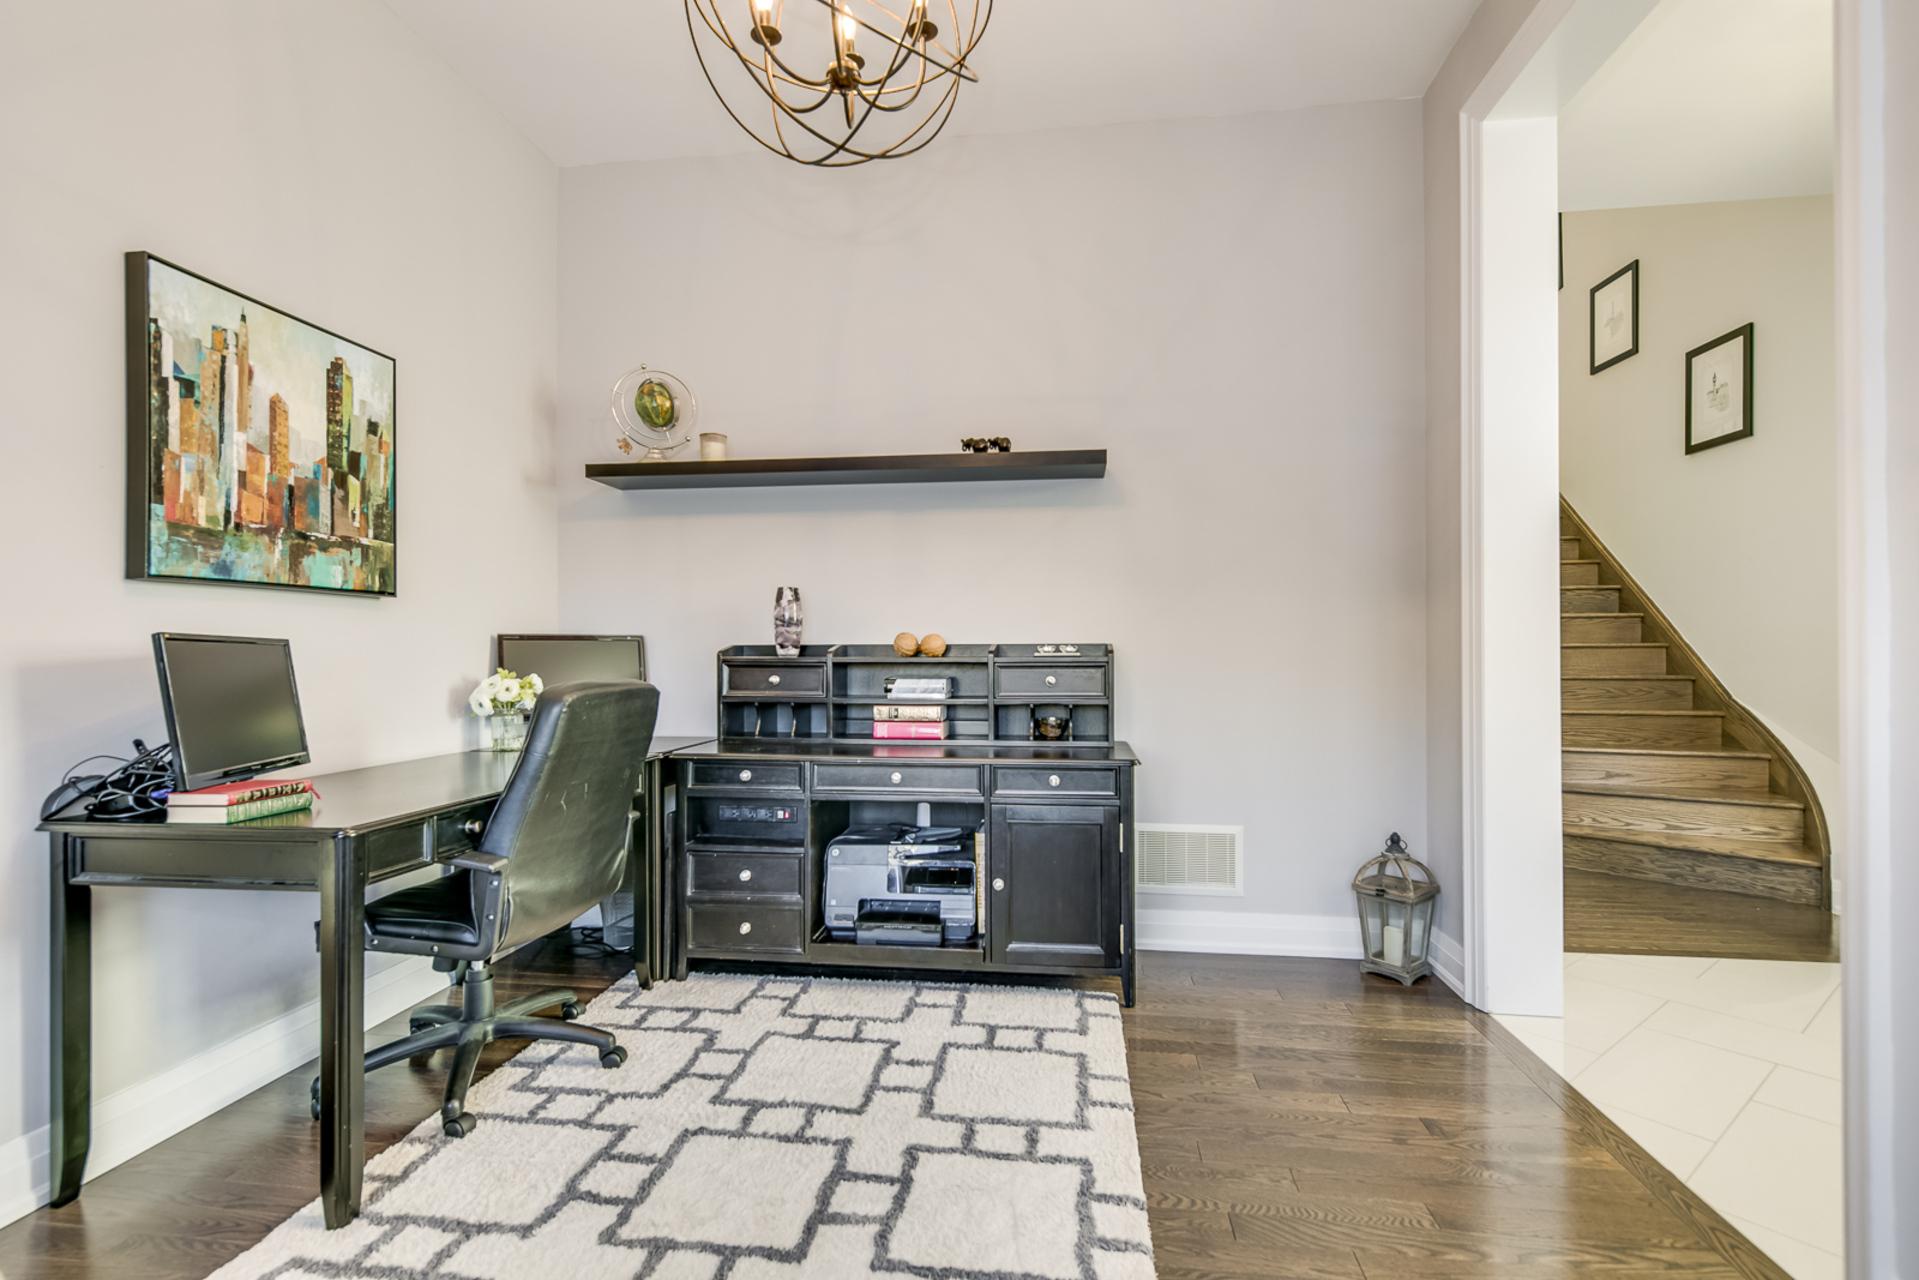 Living Room - 166 Mcwilliams Cres, Oakville - Elite3 & Team at 166 Mcwilliams Crescent, Rural Oakville, Oakville